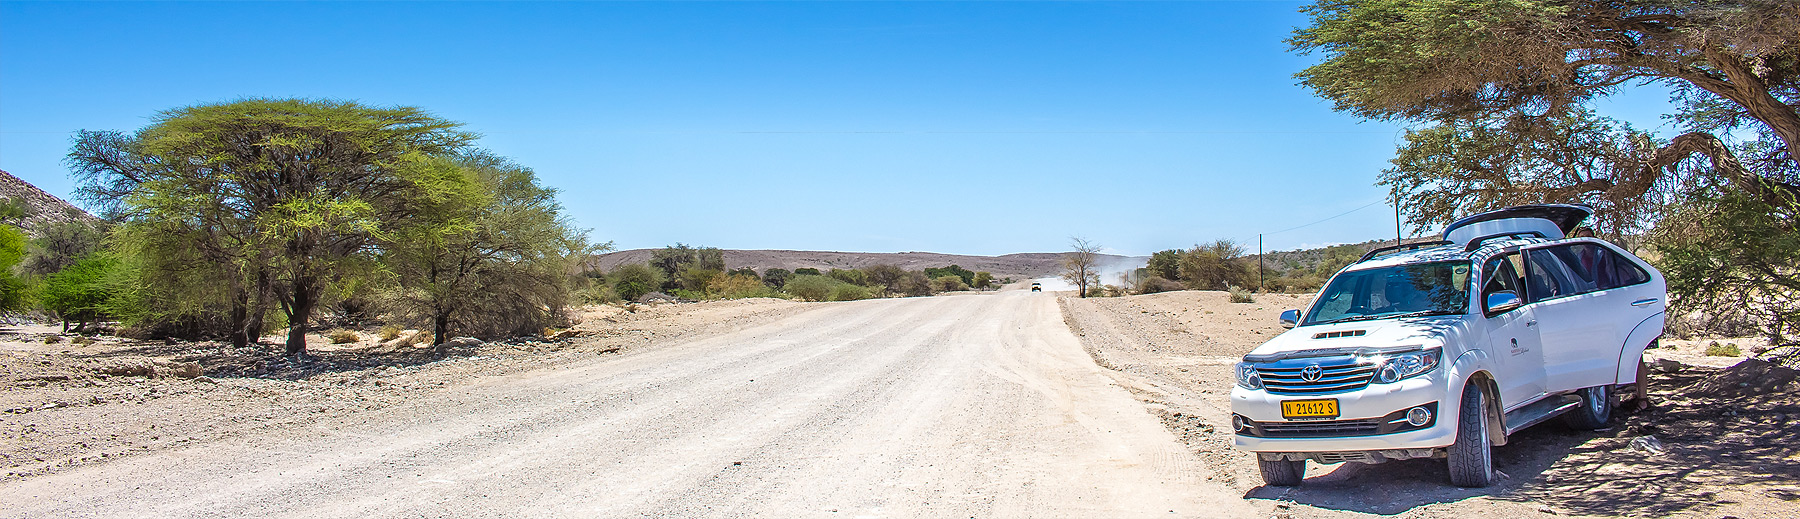 Self-drive Africa